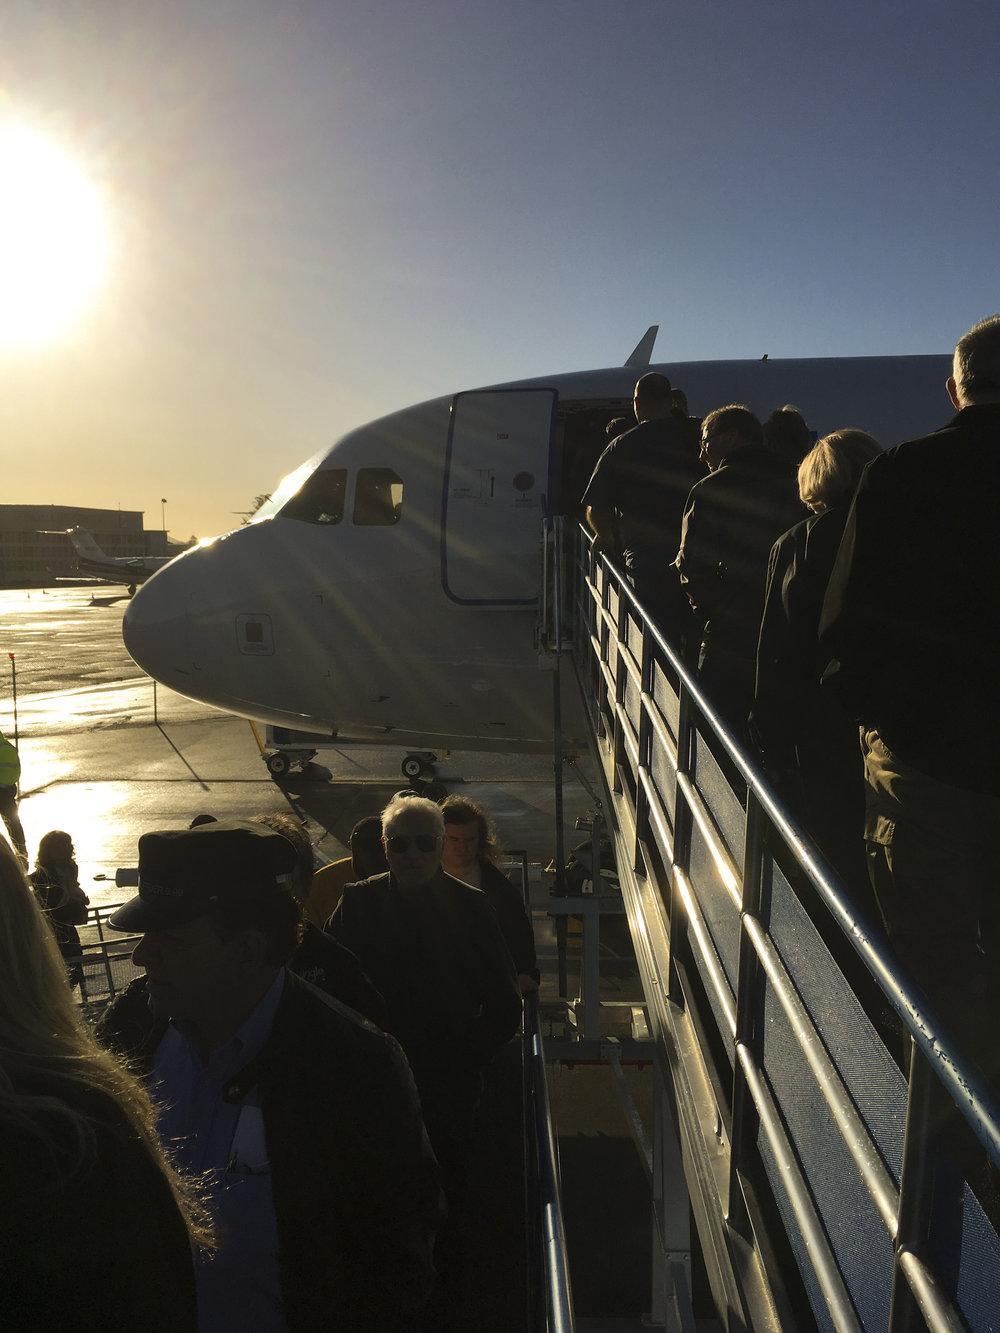 Passengers board Las Vegas bound Allegiant Air flight 124 at Sonoma County Airport in Santa Rosa, Calif., Sunday, Nov. 26, 2016.